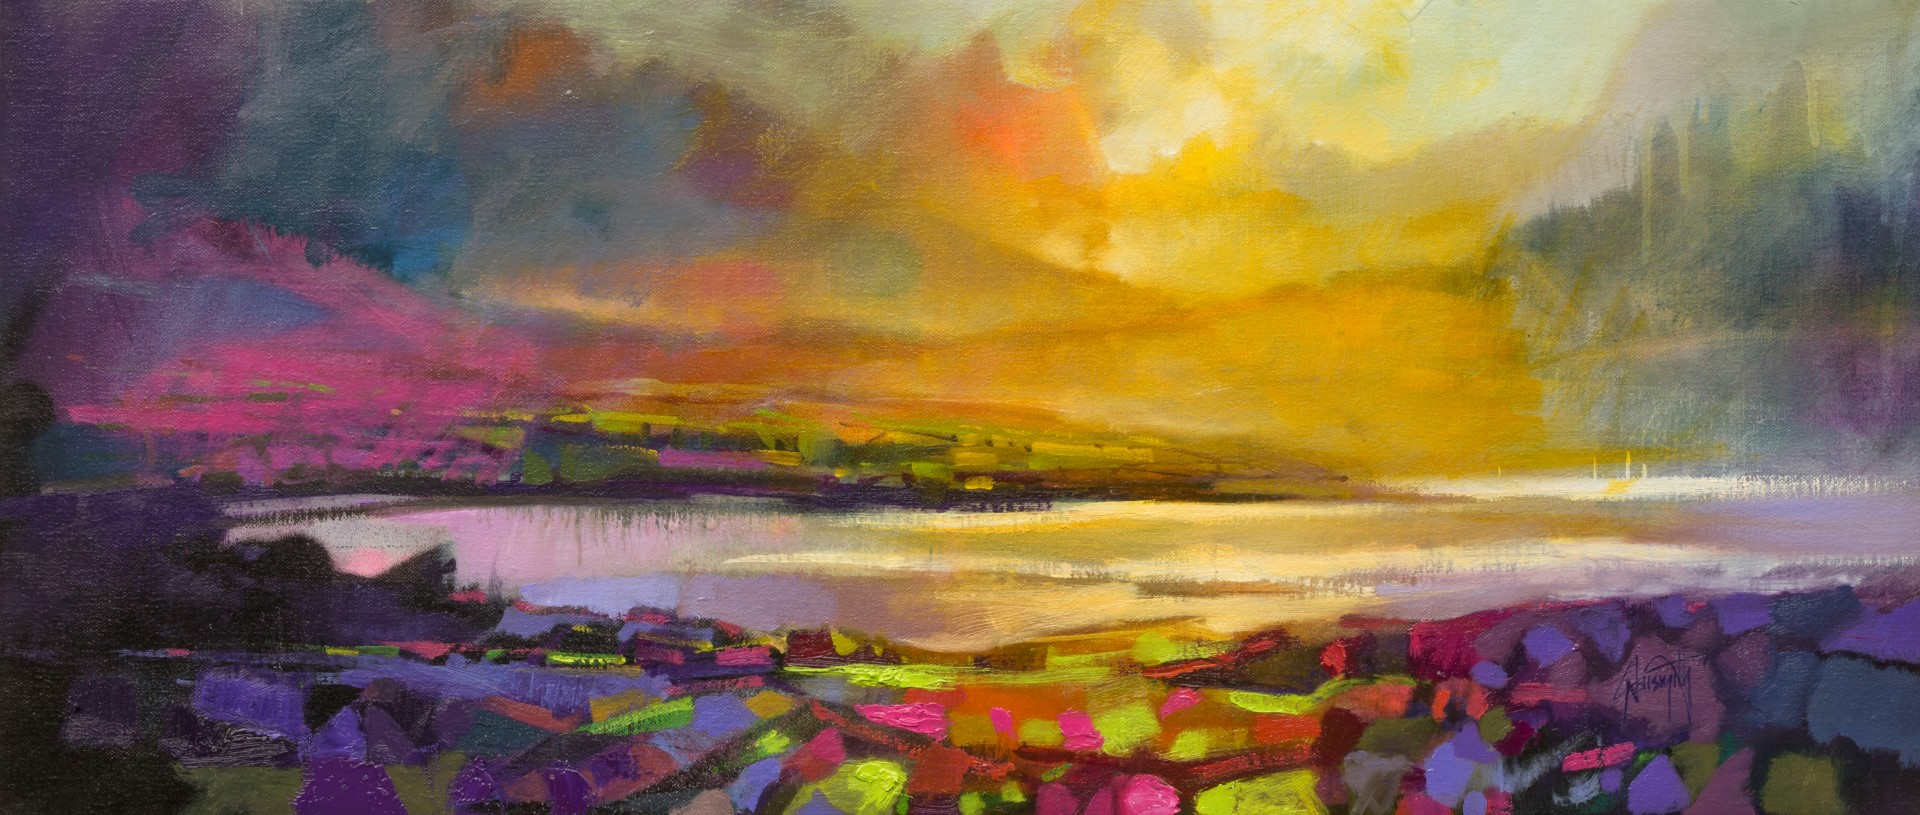 1920x815 Highland Heather Semi Abstract Scottish Landscape Painting